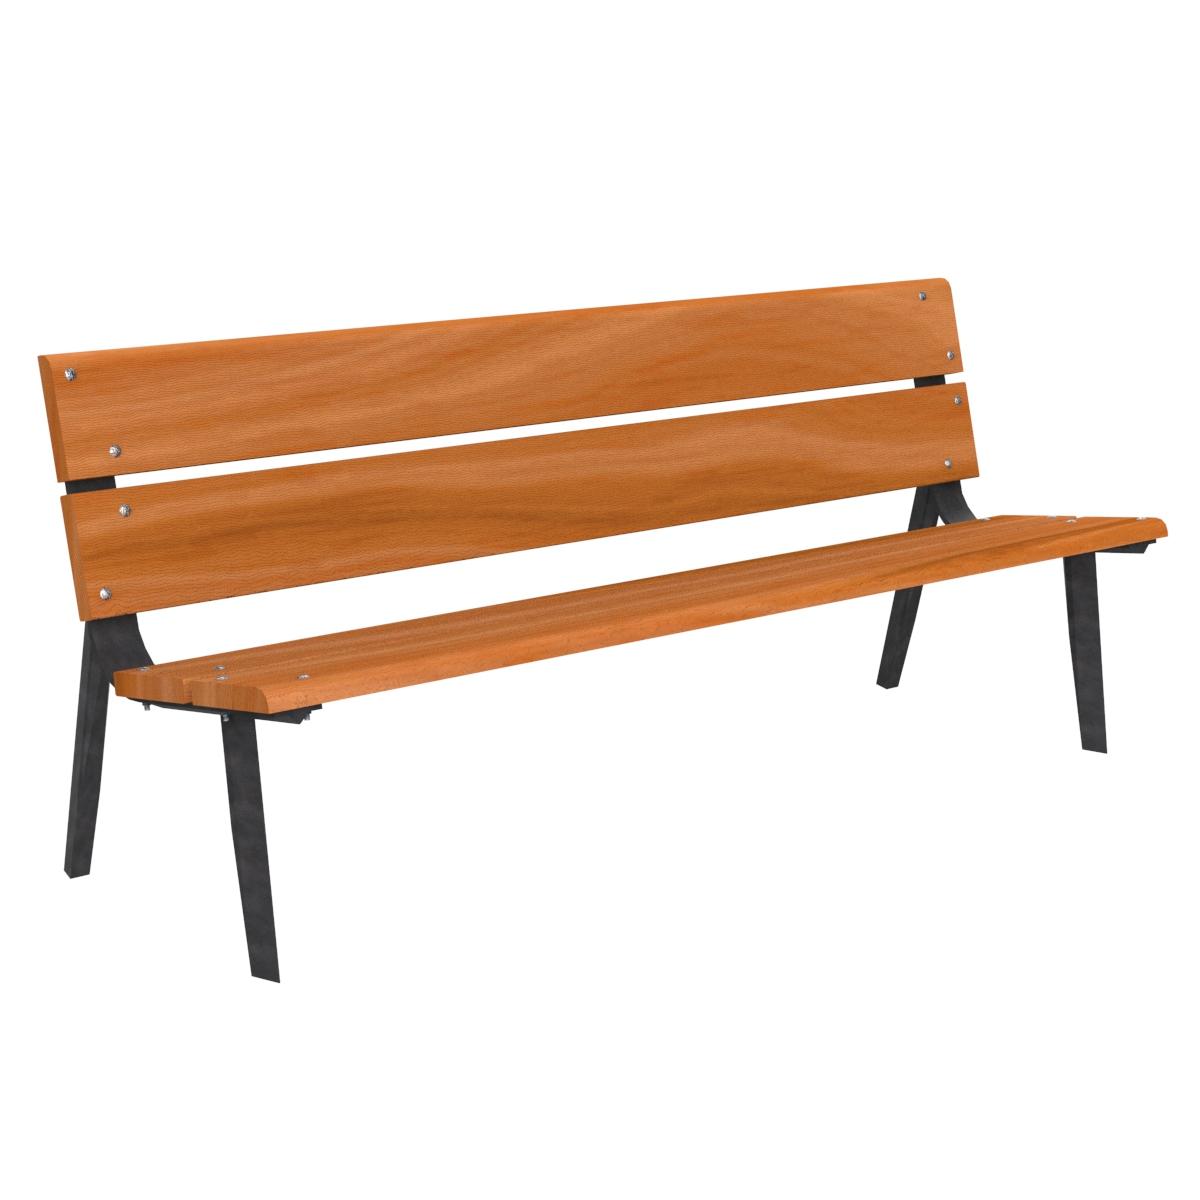 Banco madera europe mobiliario urbano para sentarse for Banco madera jardin